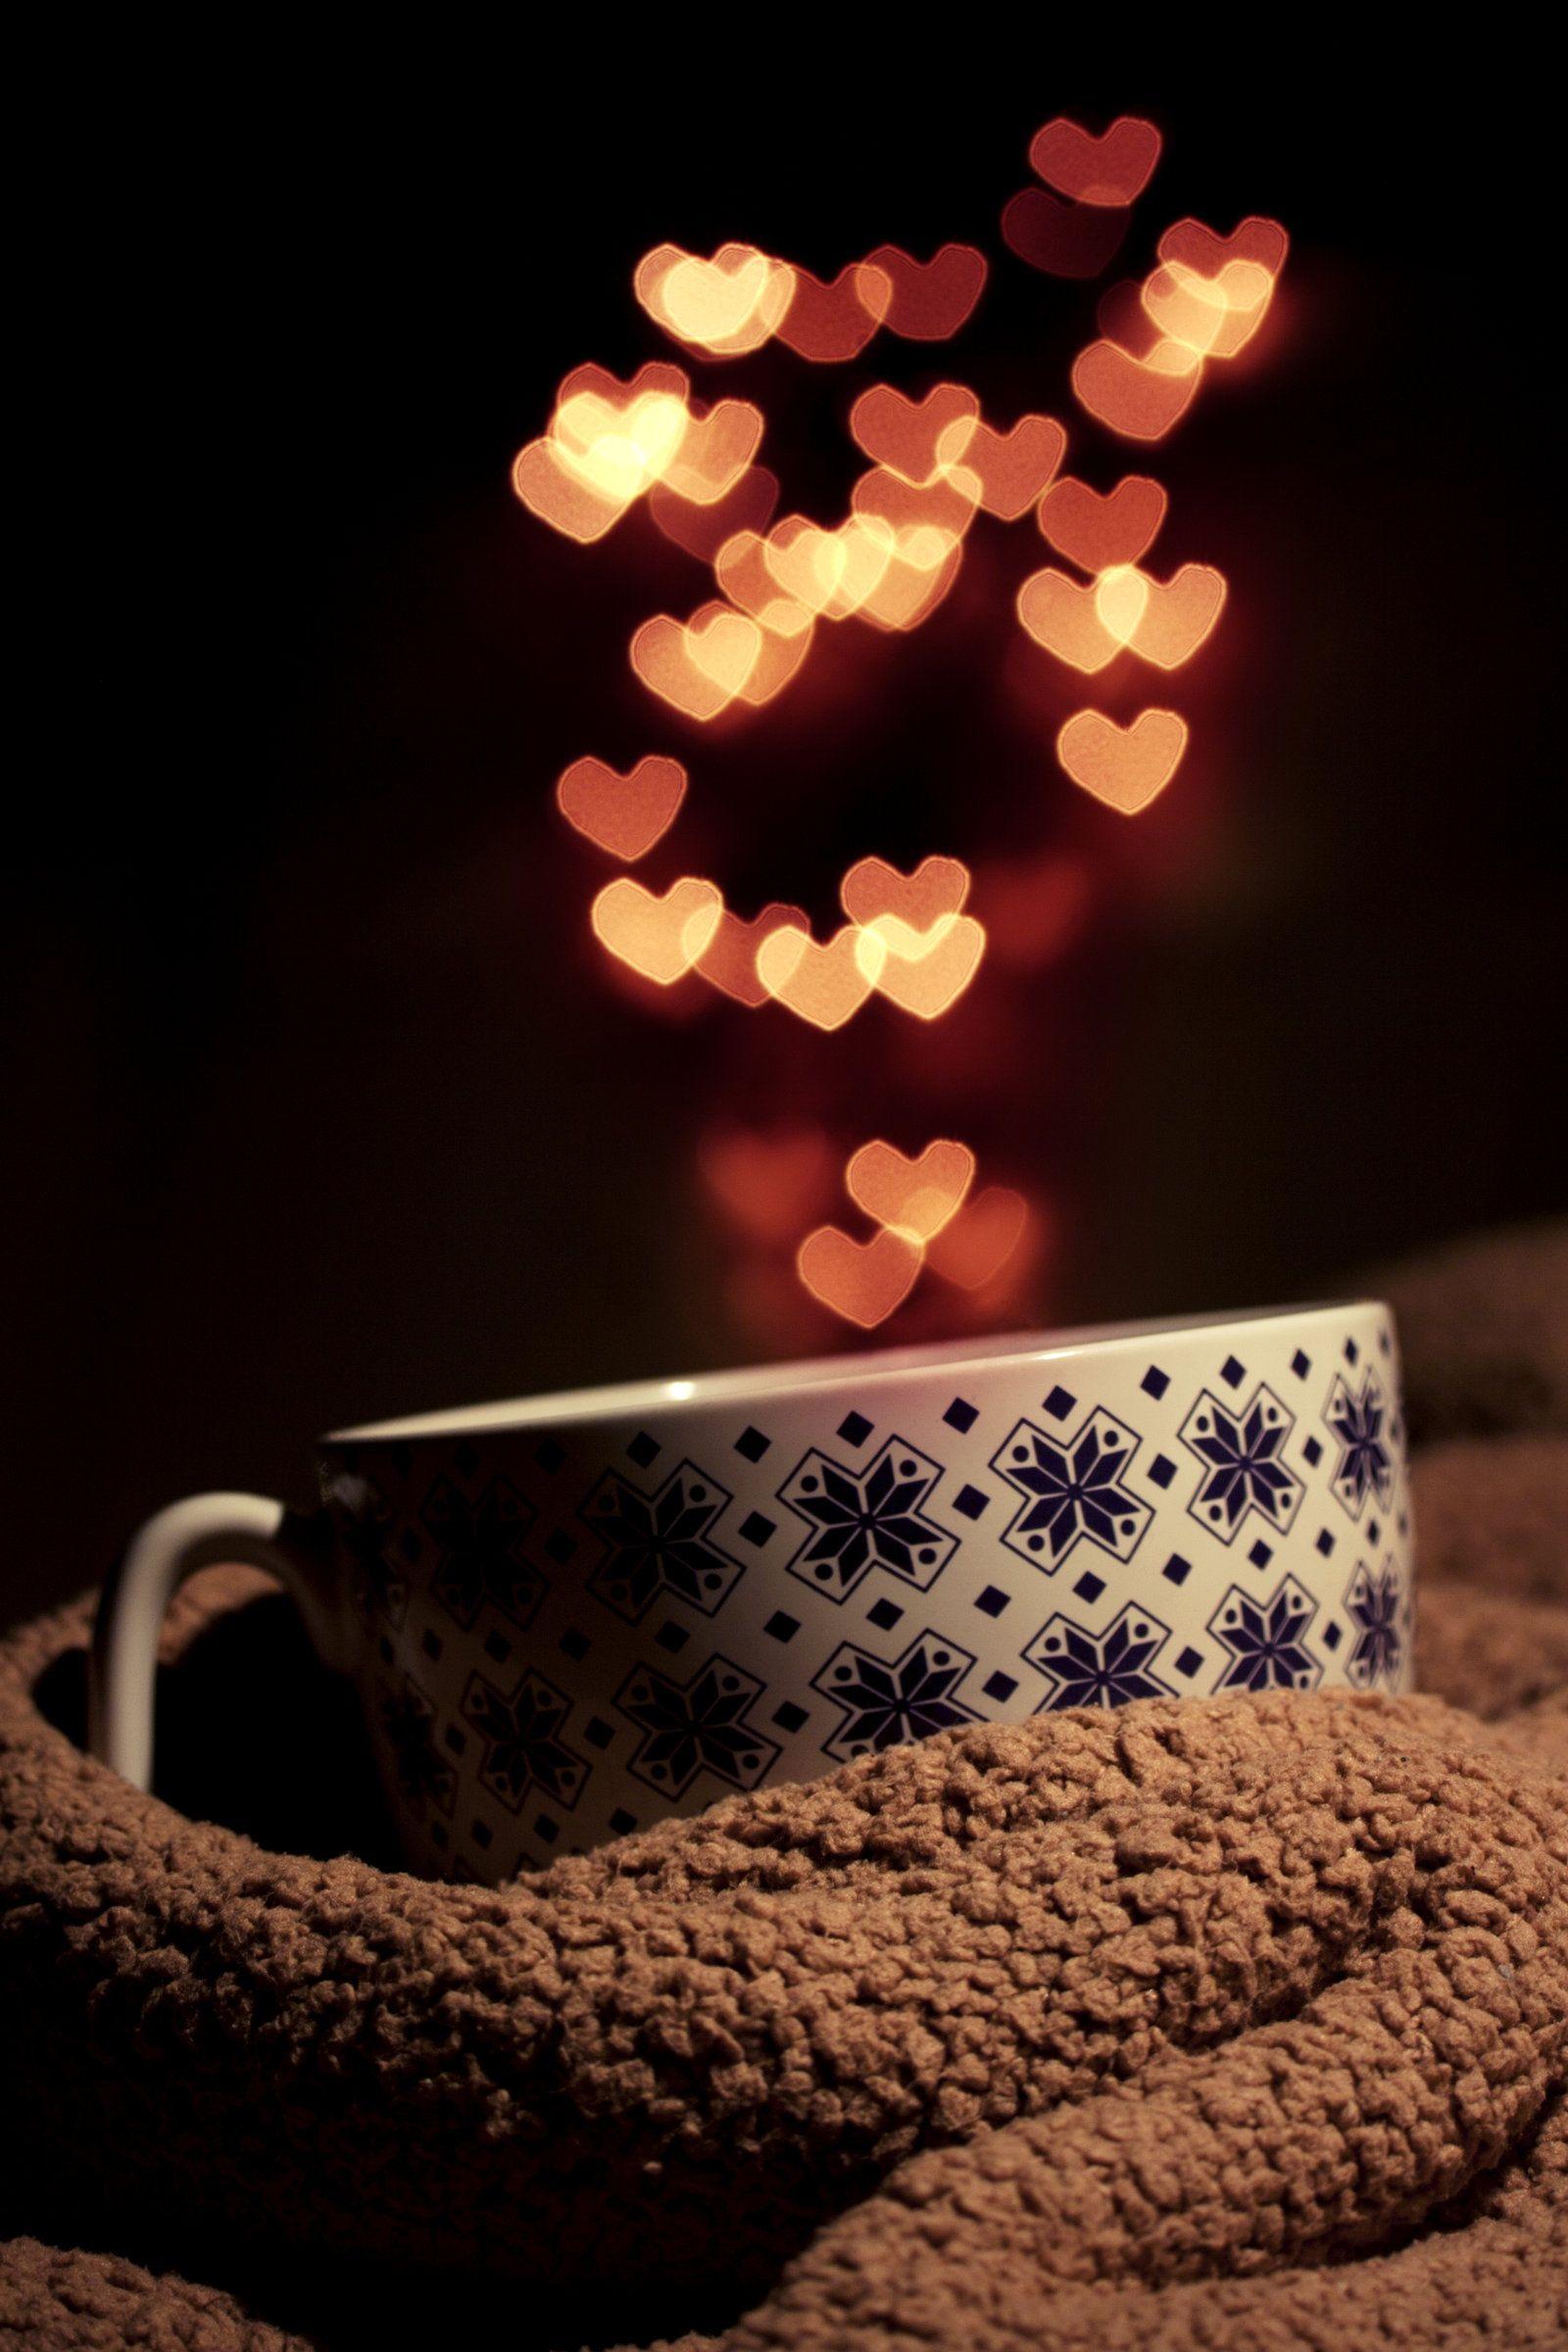 Hot coffee chocolate his